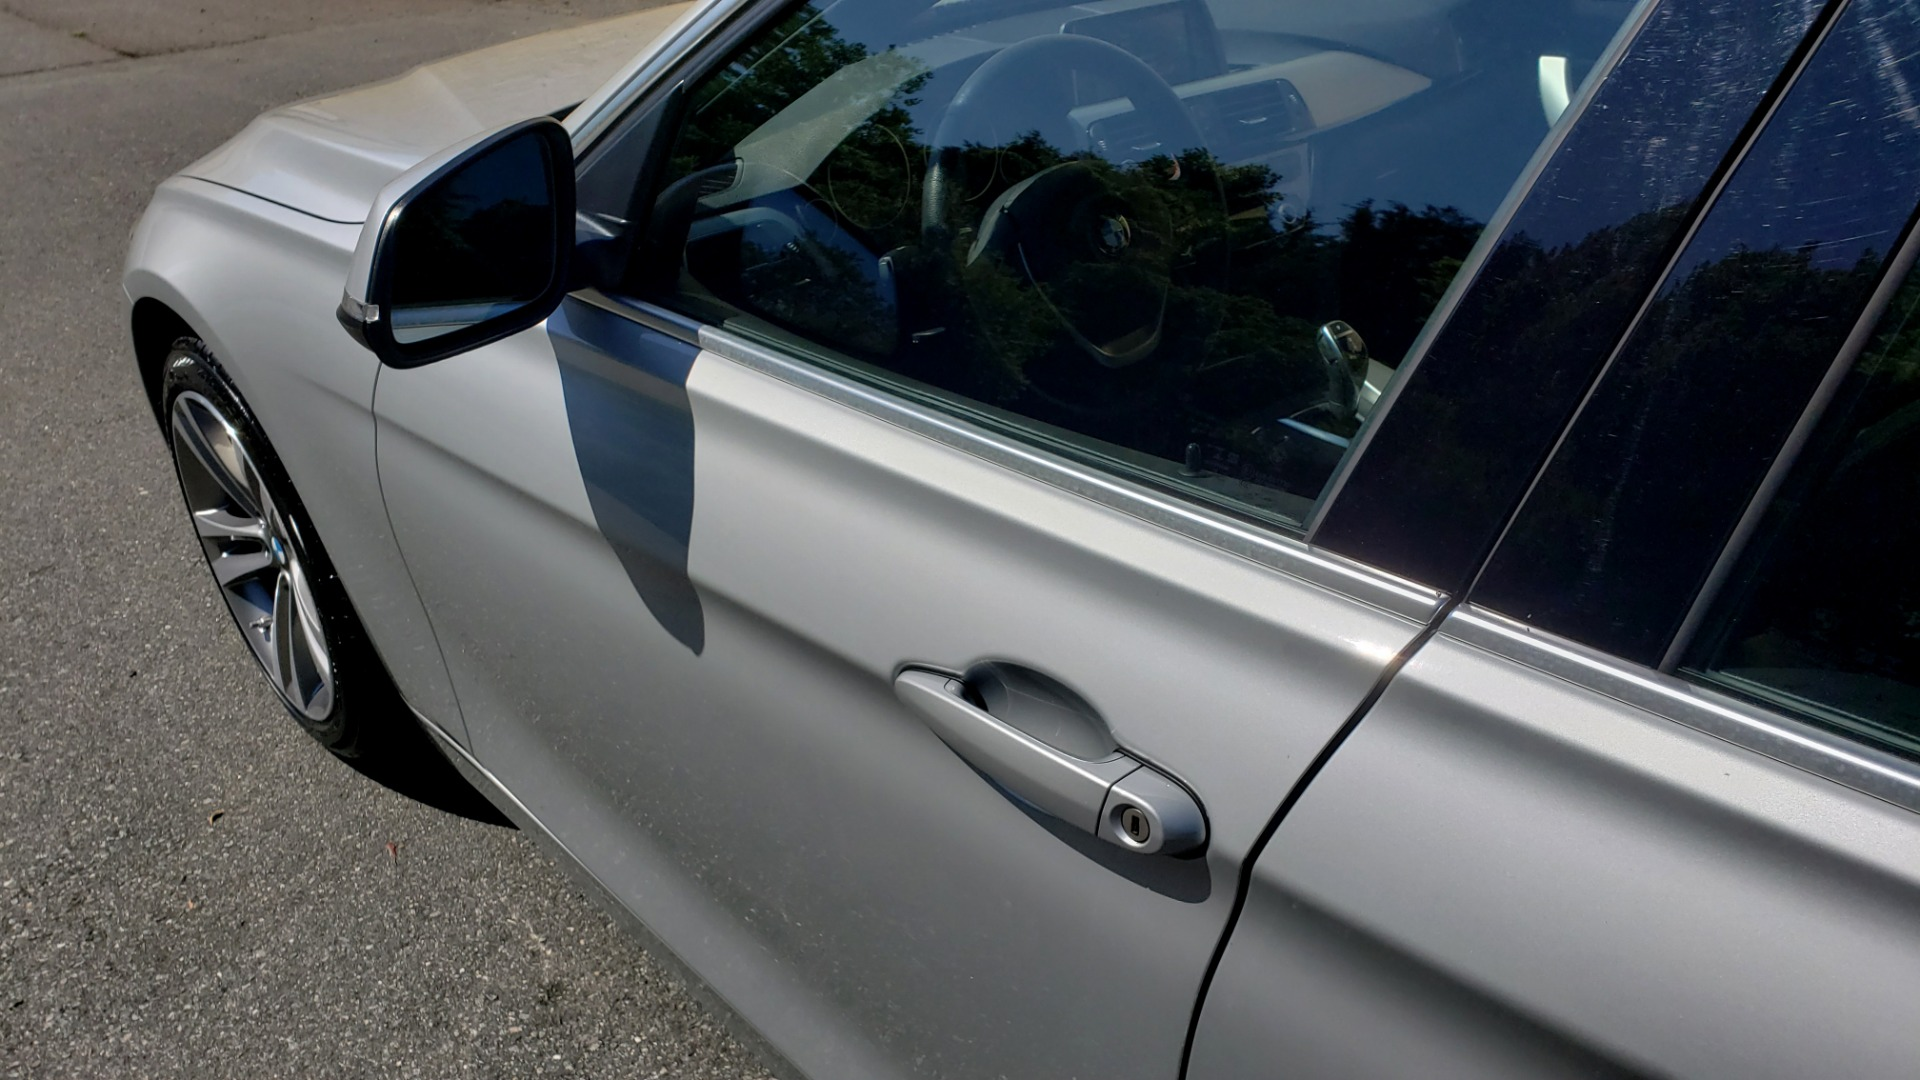 Used 2017 BMW 3 SERIES 330I SPORT SEDAN / DRVR ASST PKG / SUNROOF / REARVIEW for sale Sold at Formula Imports in Charlotte NC 28227 7